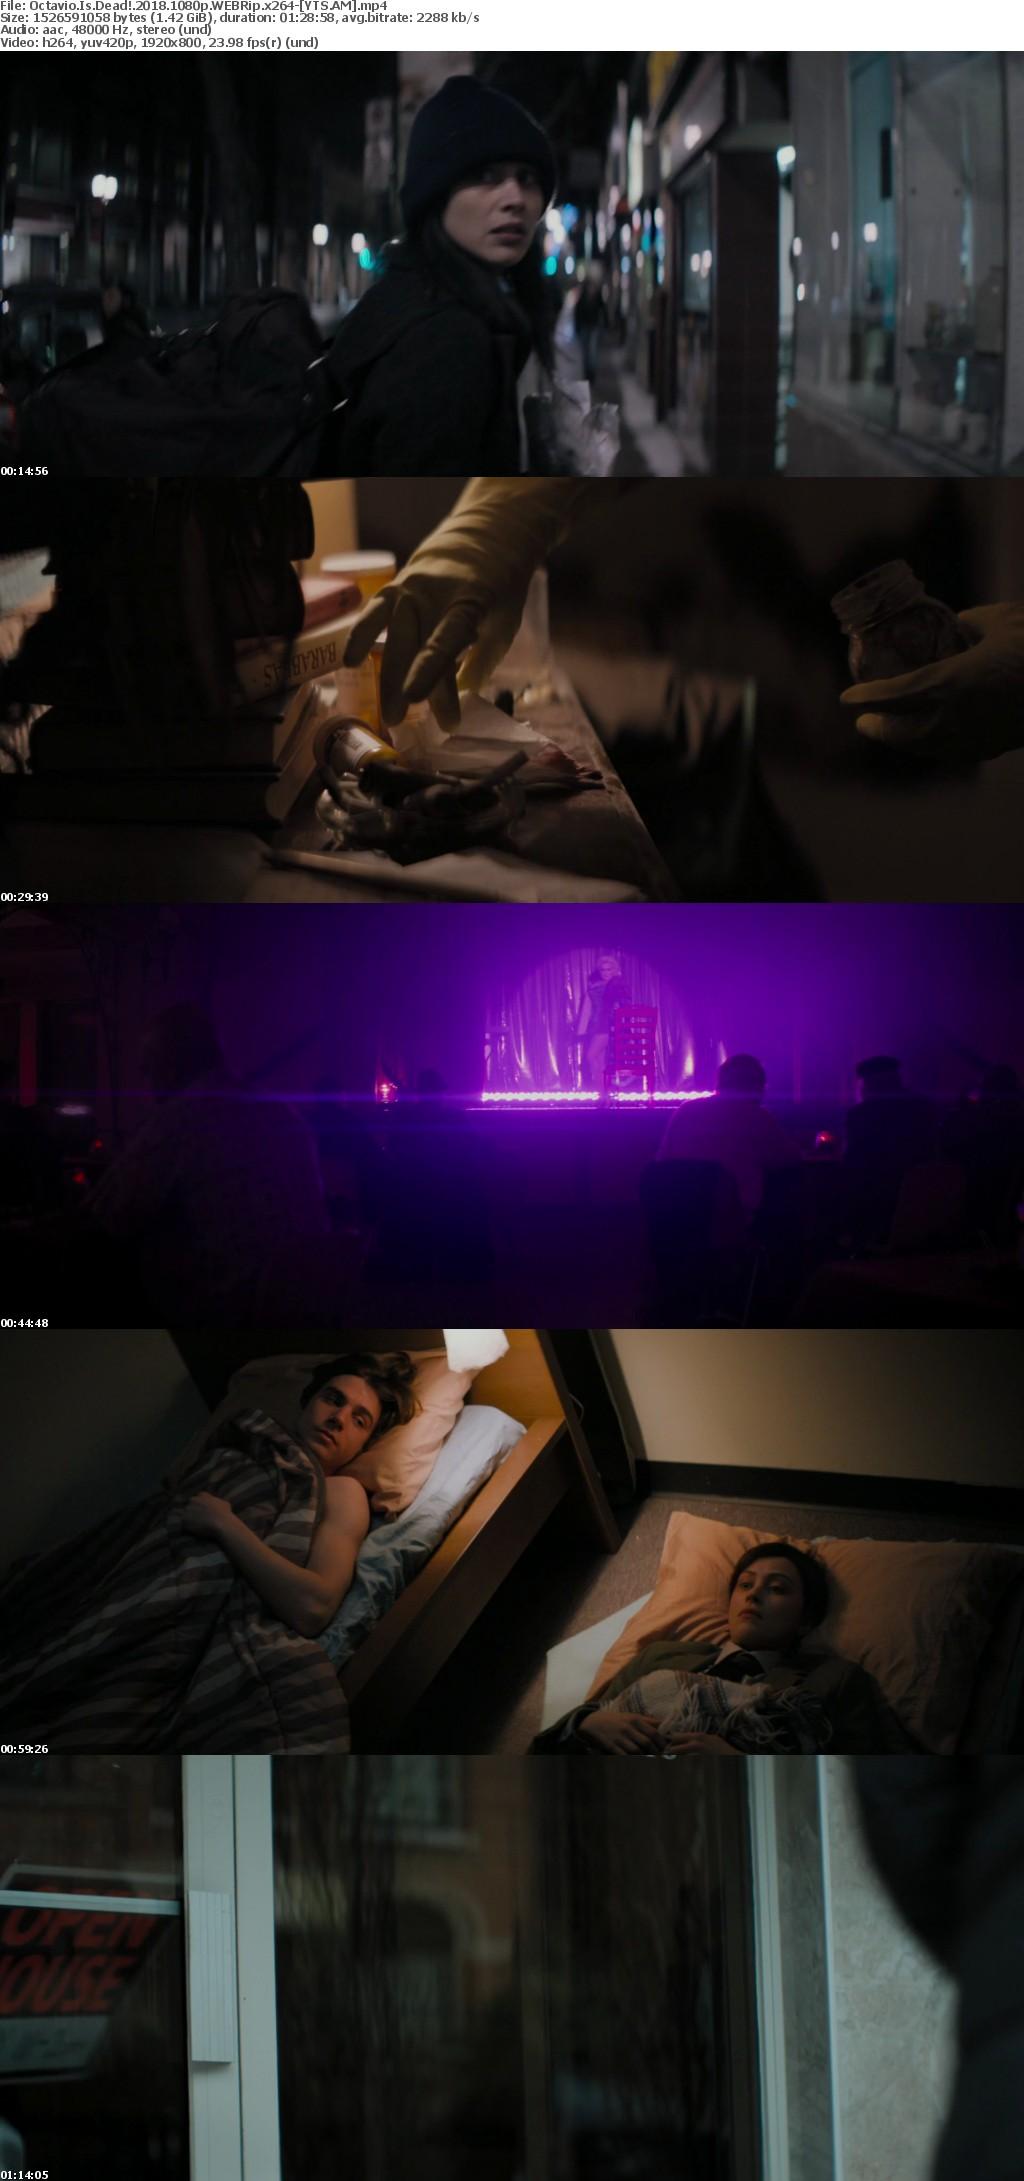 Octavio Is Dead! (2018) [WEBRip] [1080p] YIFY